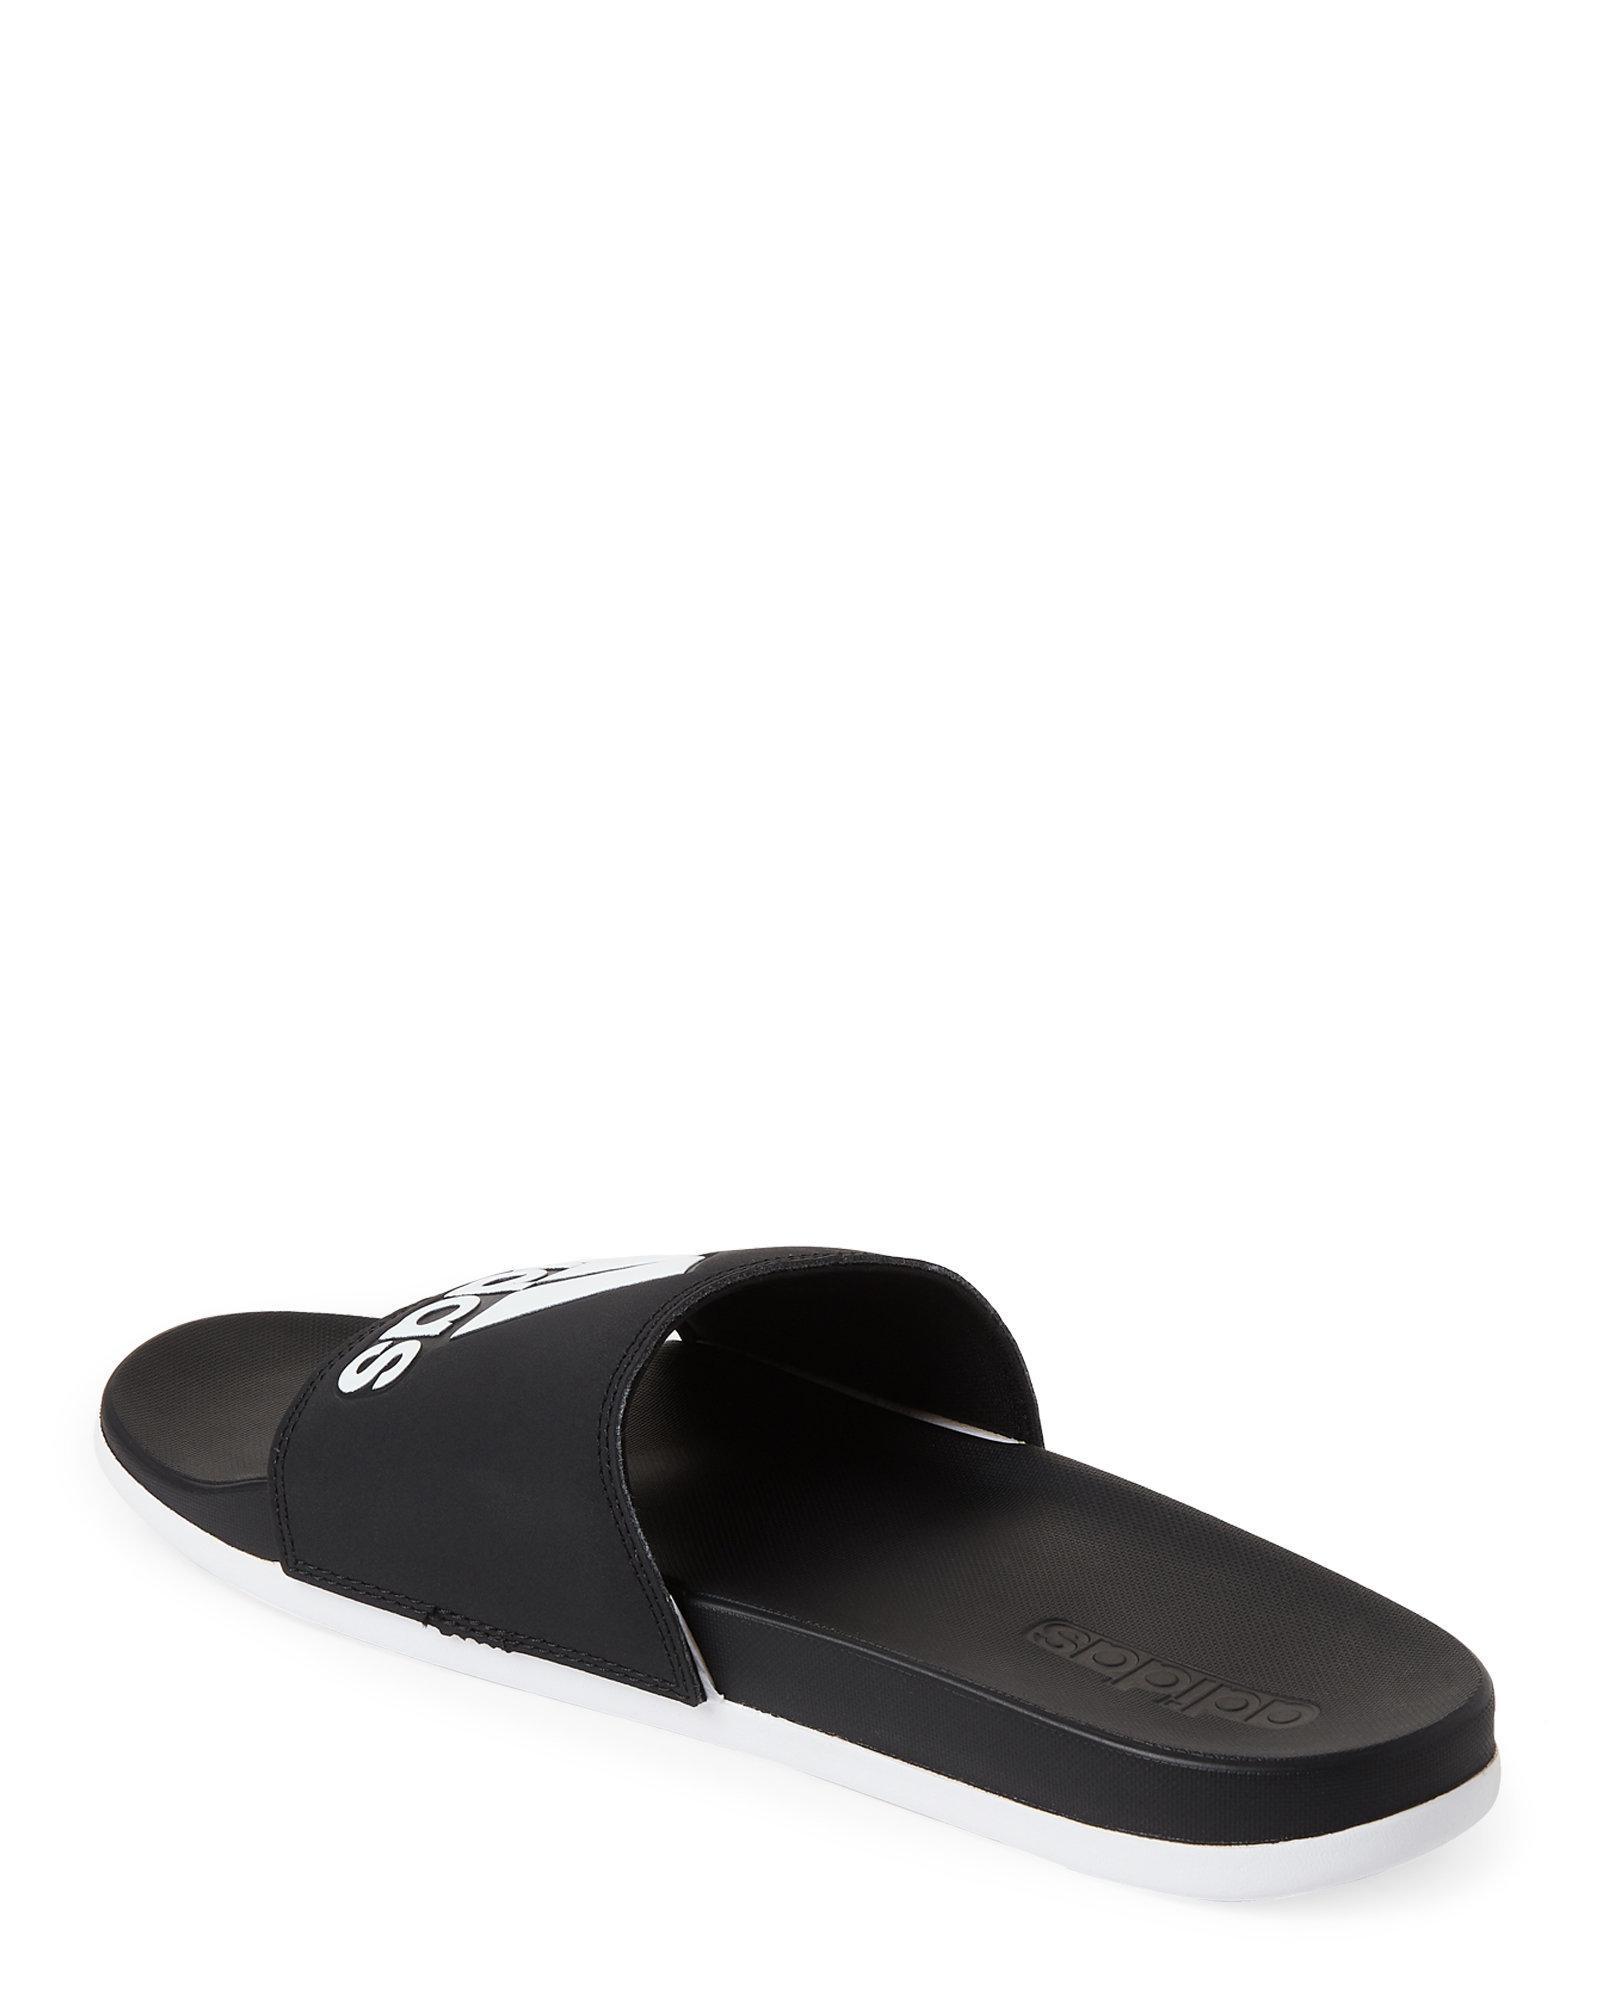 fe2ef441d69 Lyst - adidas Black   White Adilette Comfort Slide Sandals in Black